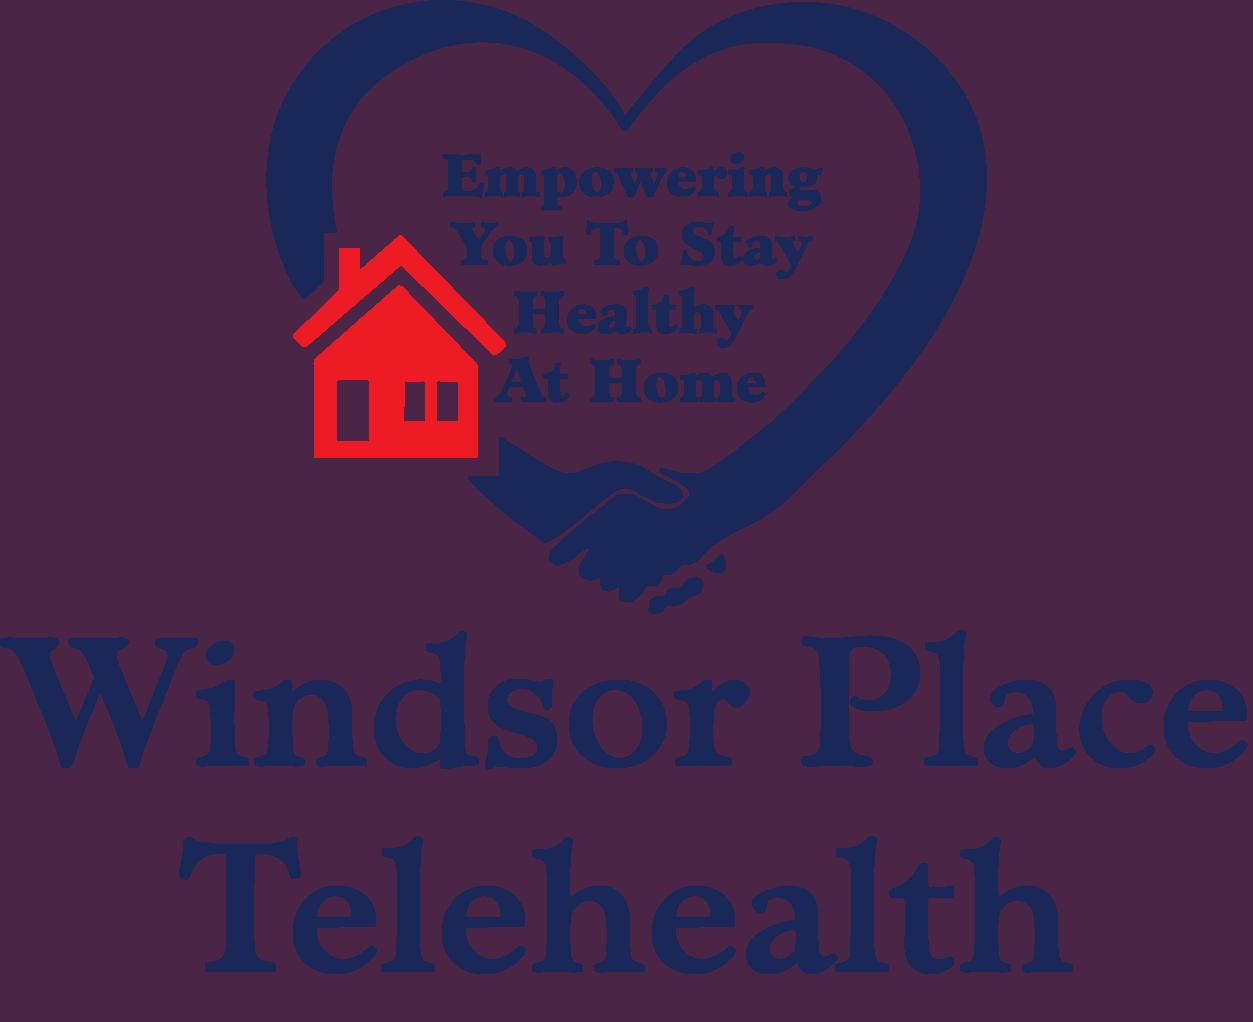 Windsor Place telehealth logo